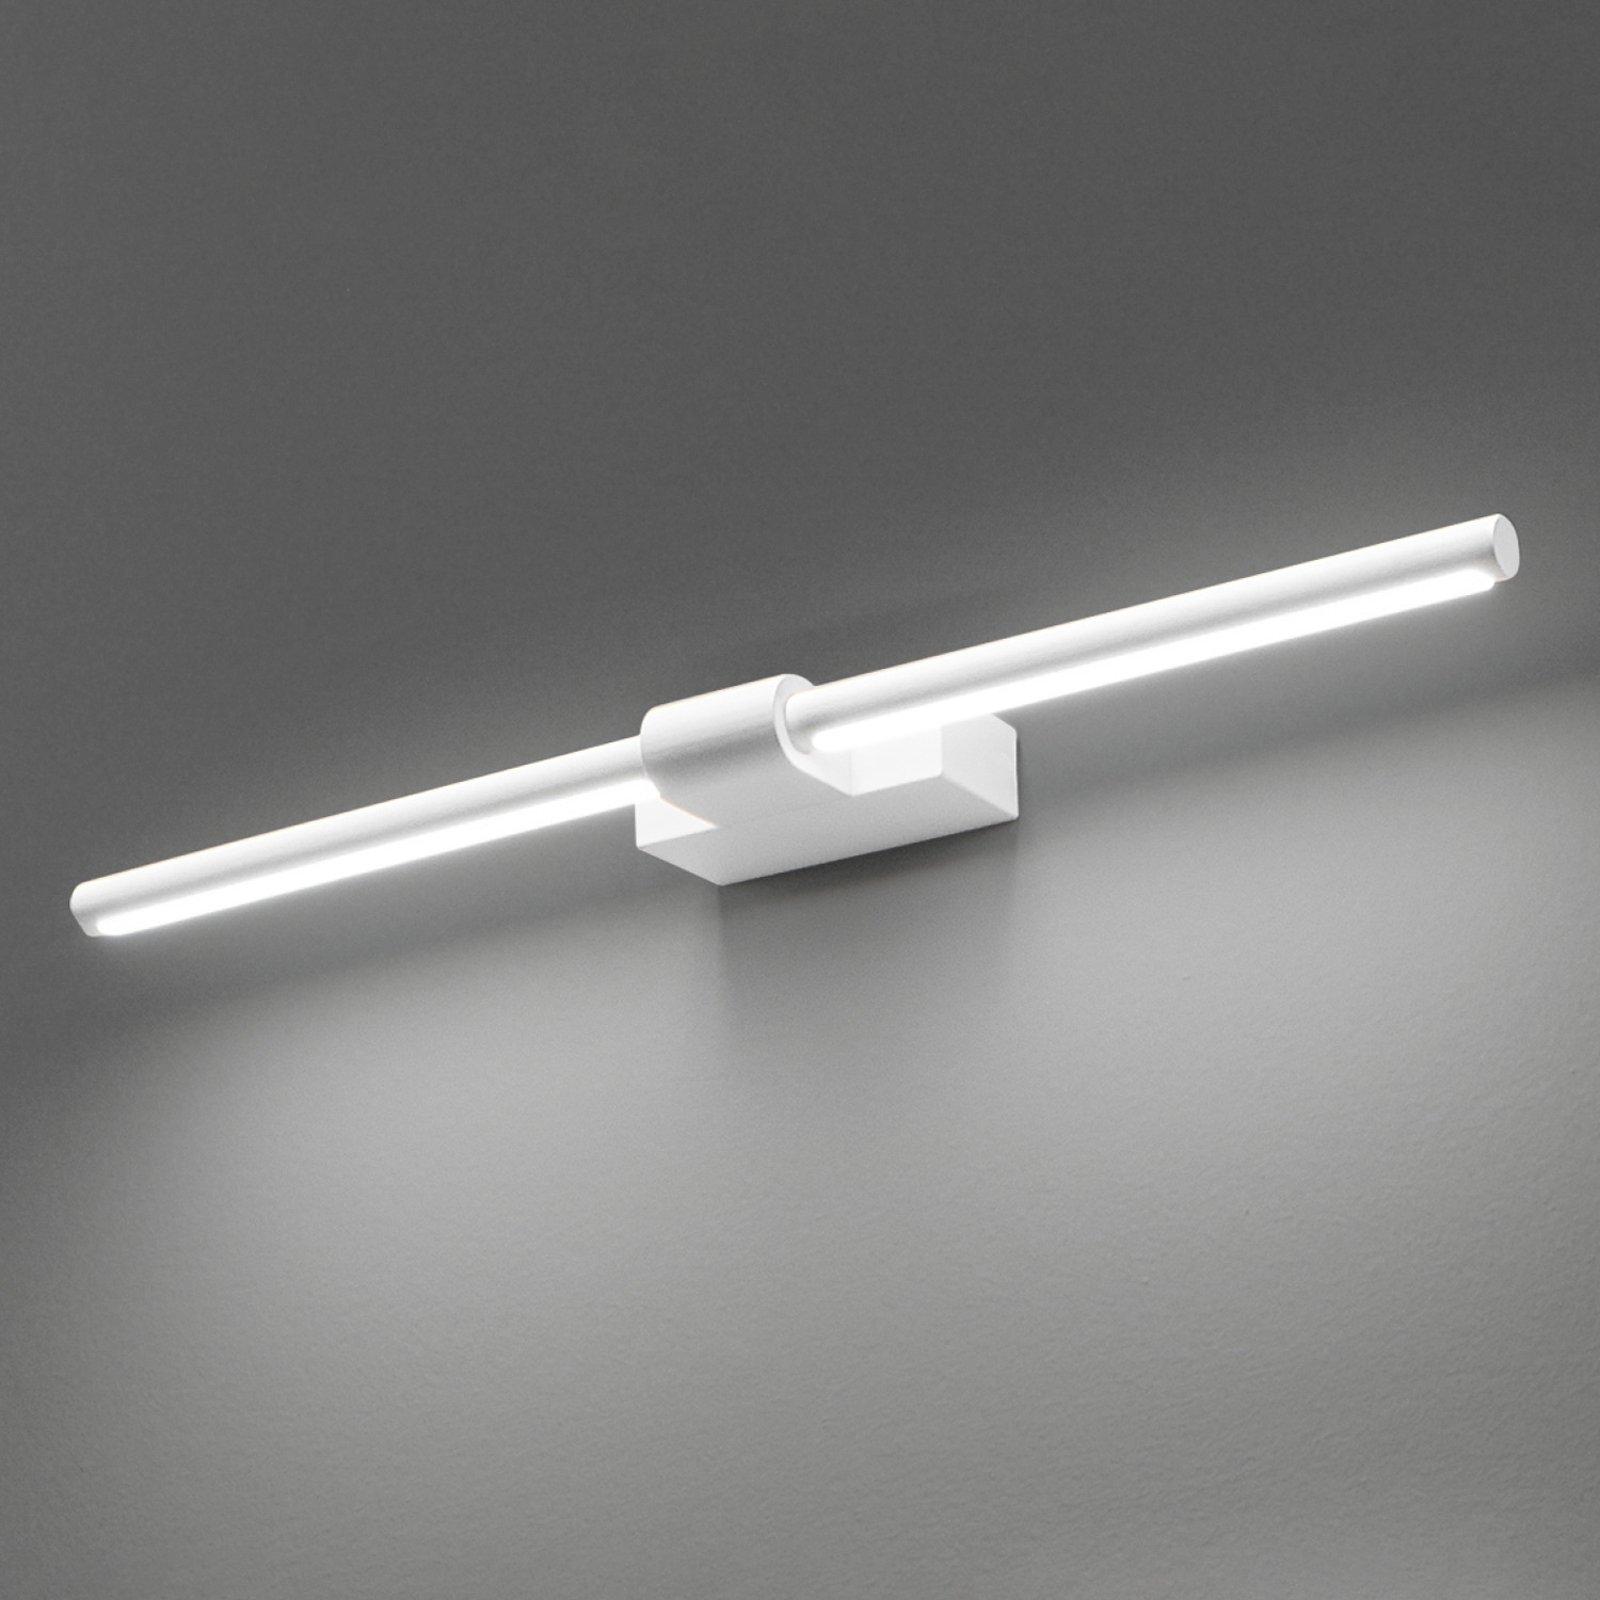 LED-vegglampe Line med dreibar spreder